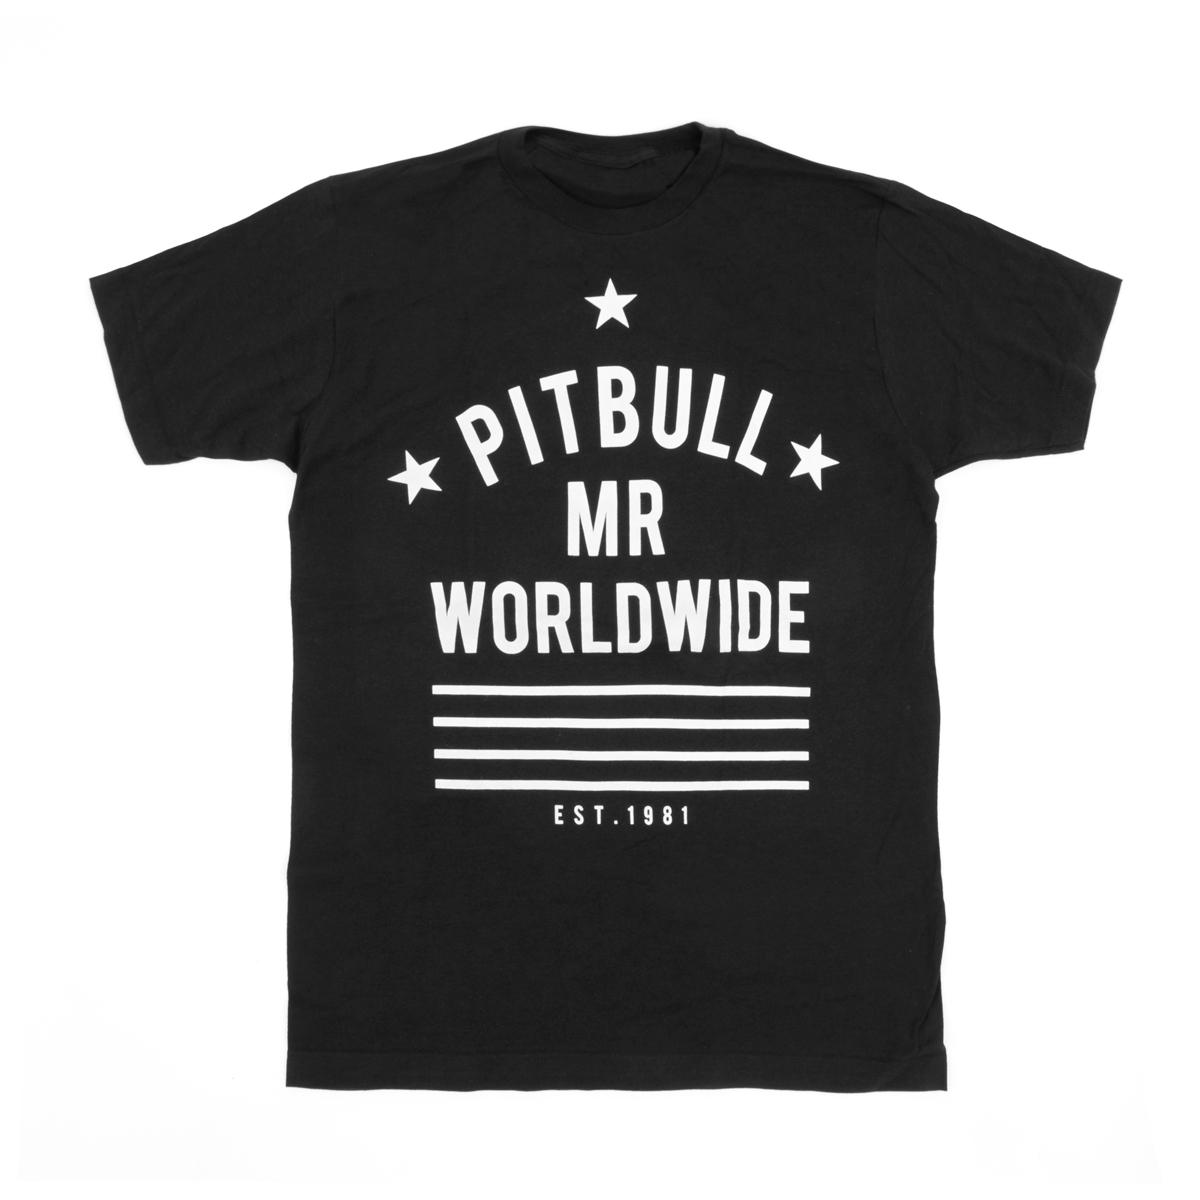 PITBULL Mr. Worldwide T-Shirt